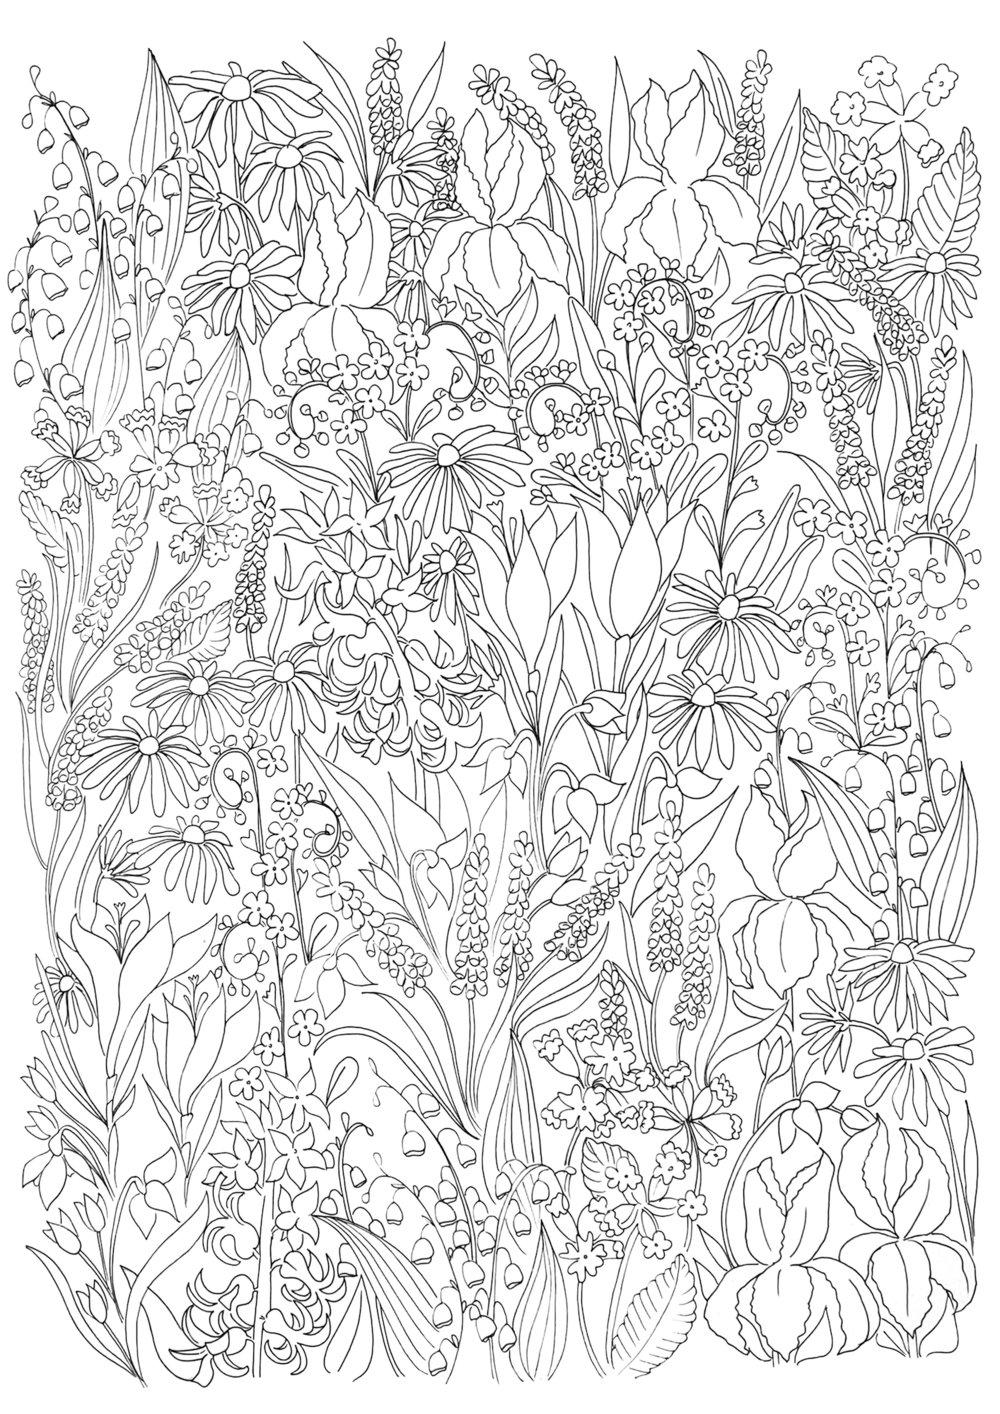 Spring flowers black and white .jpg